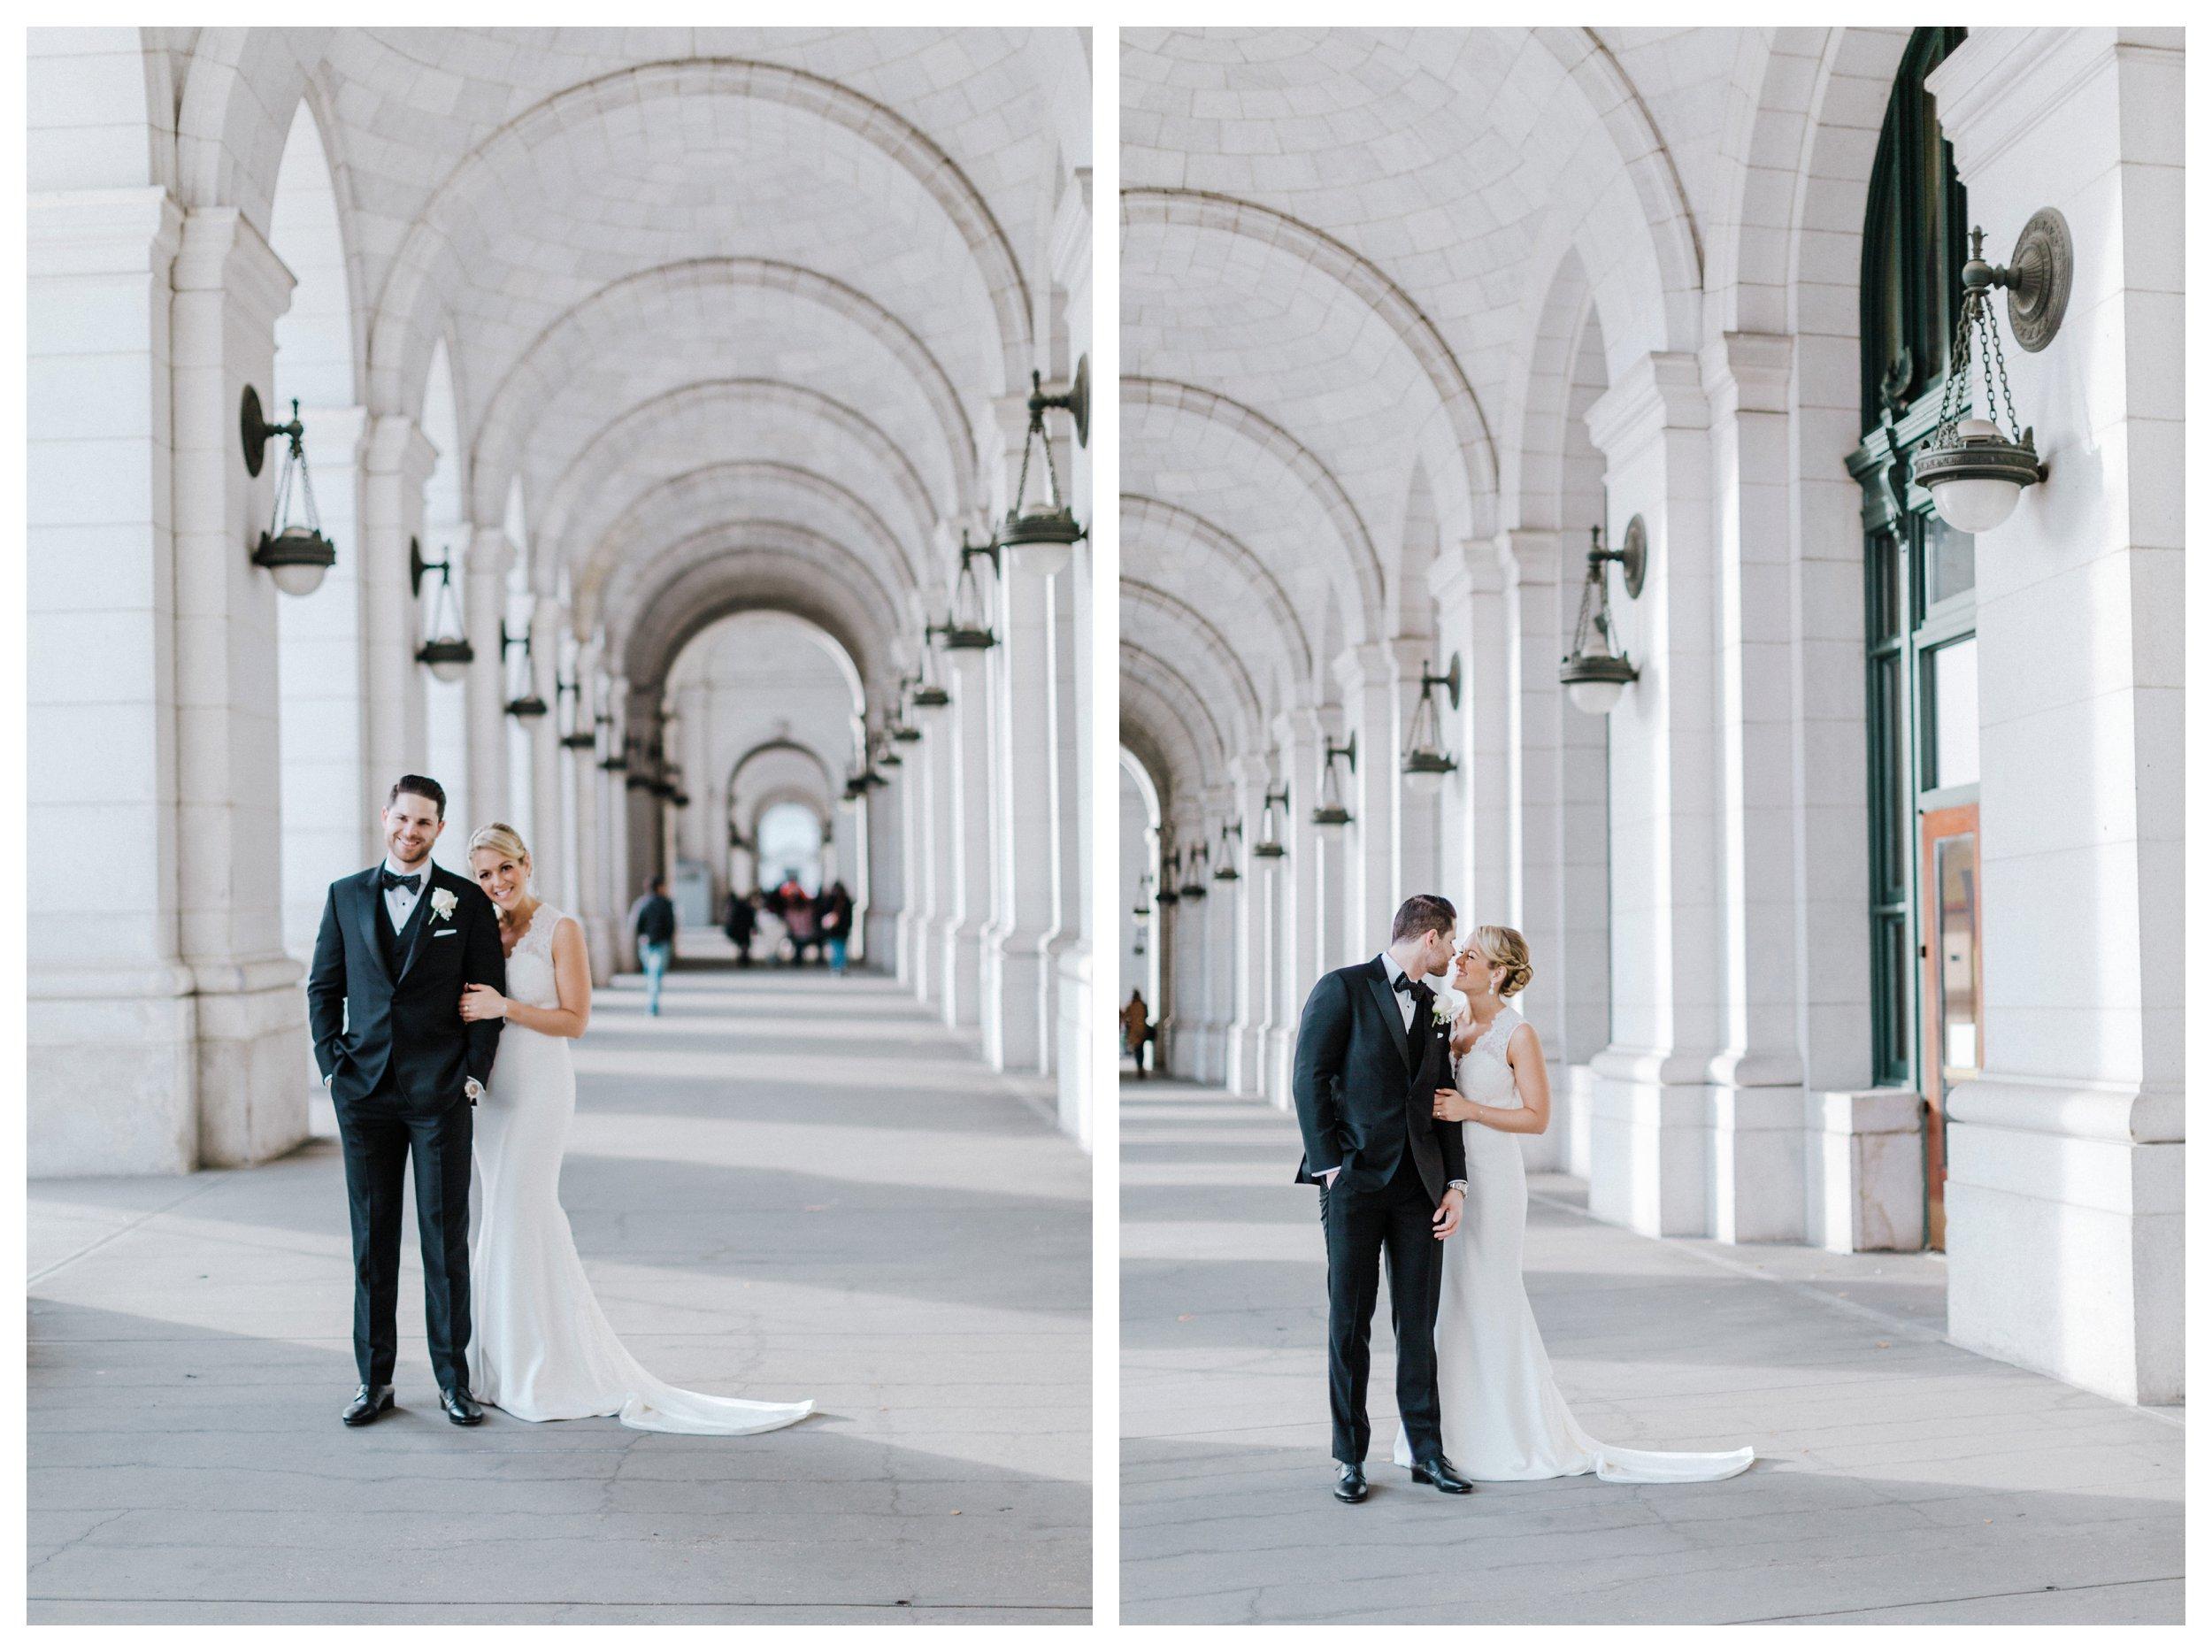 washington-dc-wedding-photographer-16.JPG